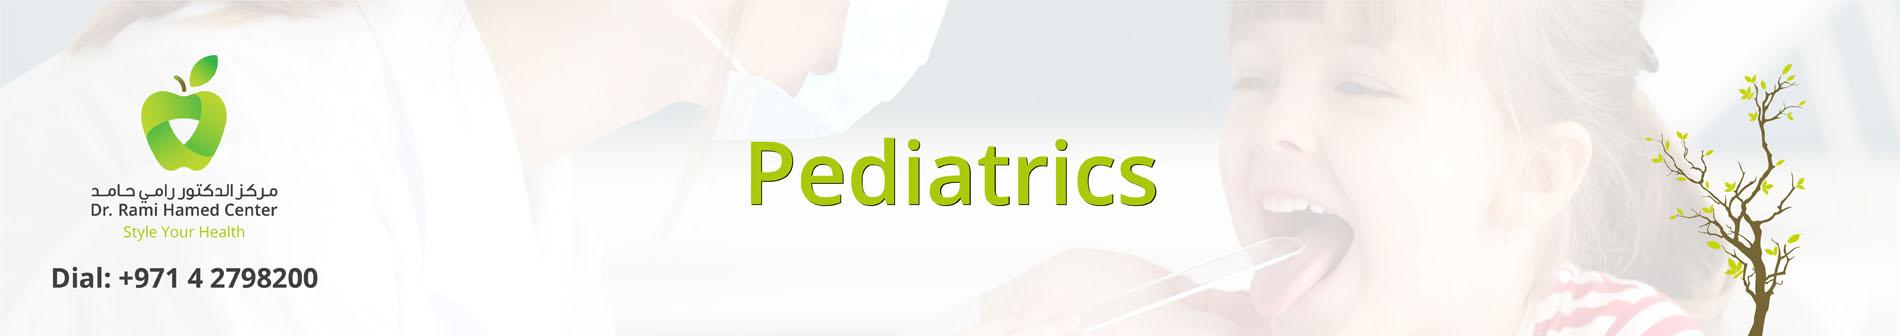 Dubai Pediatric Clinic